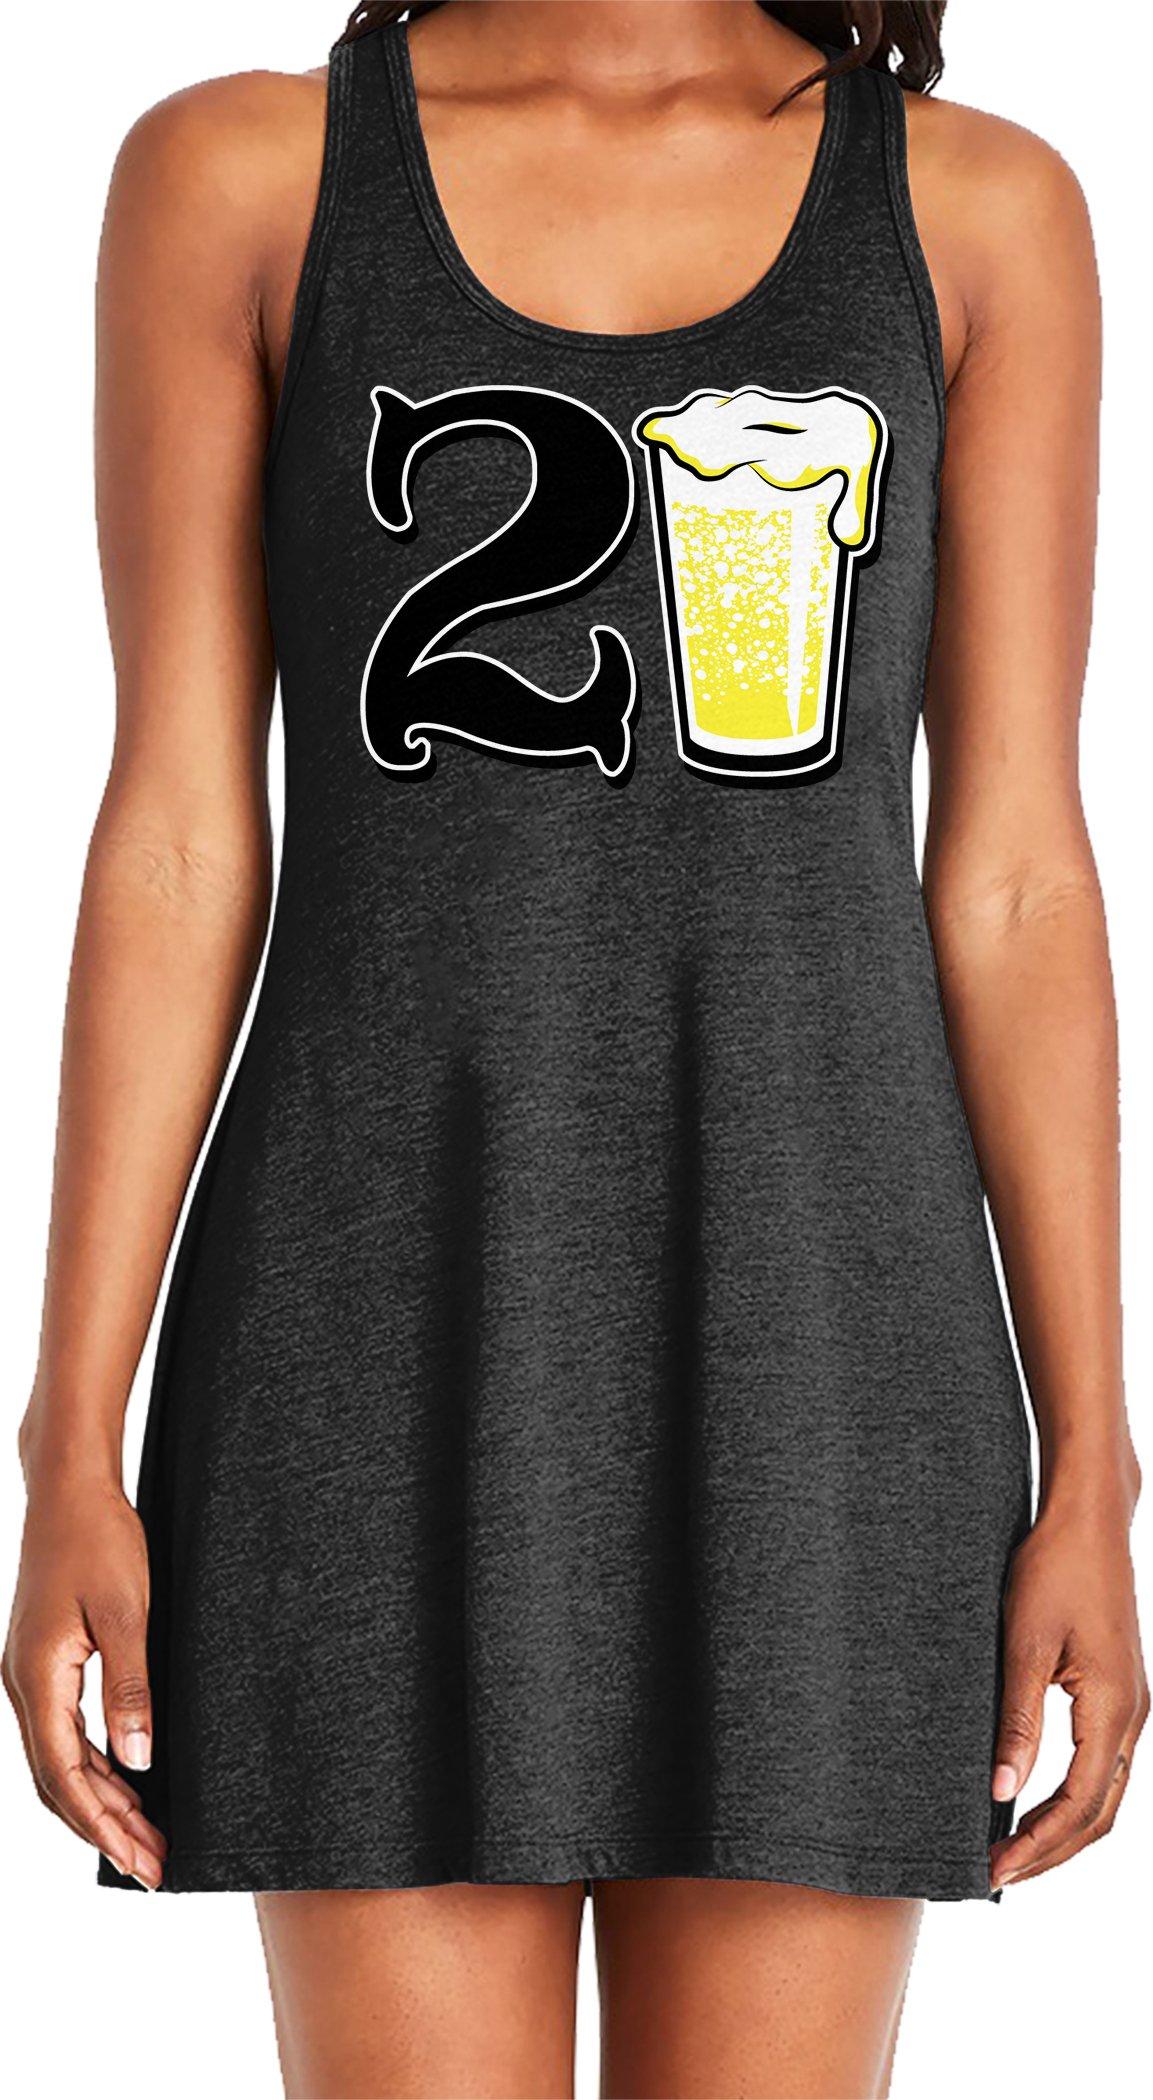 Amdesco Ladies 21 Years Old, 21st Birthday Casual Racerback Tank Dress, Black Small